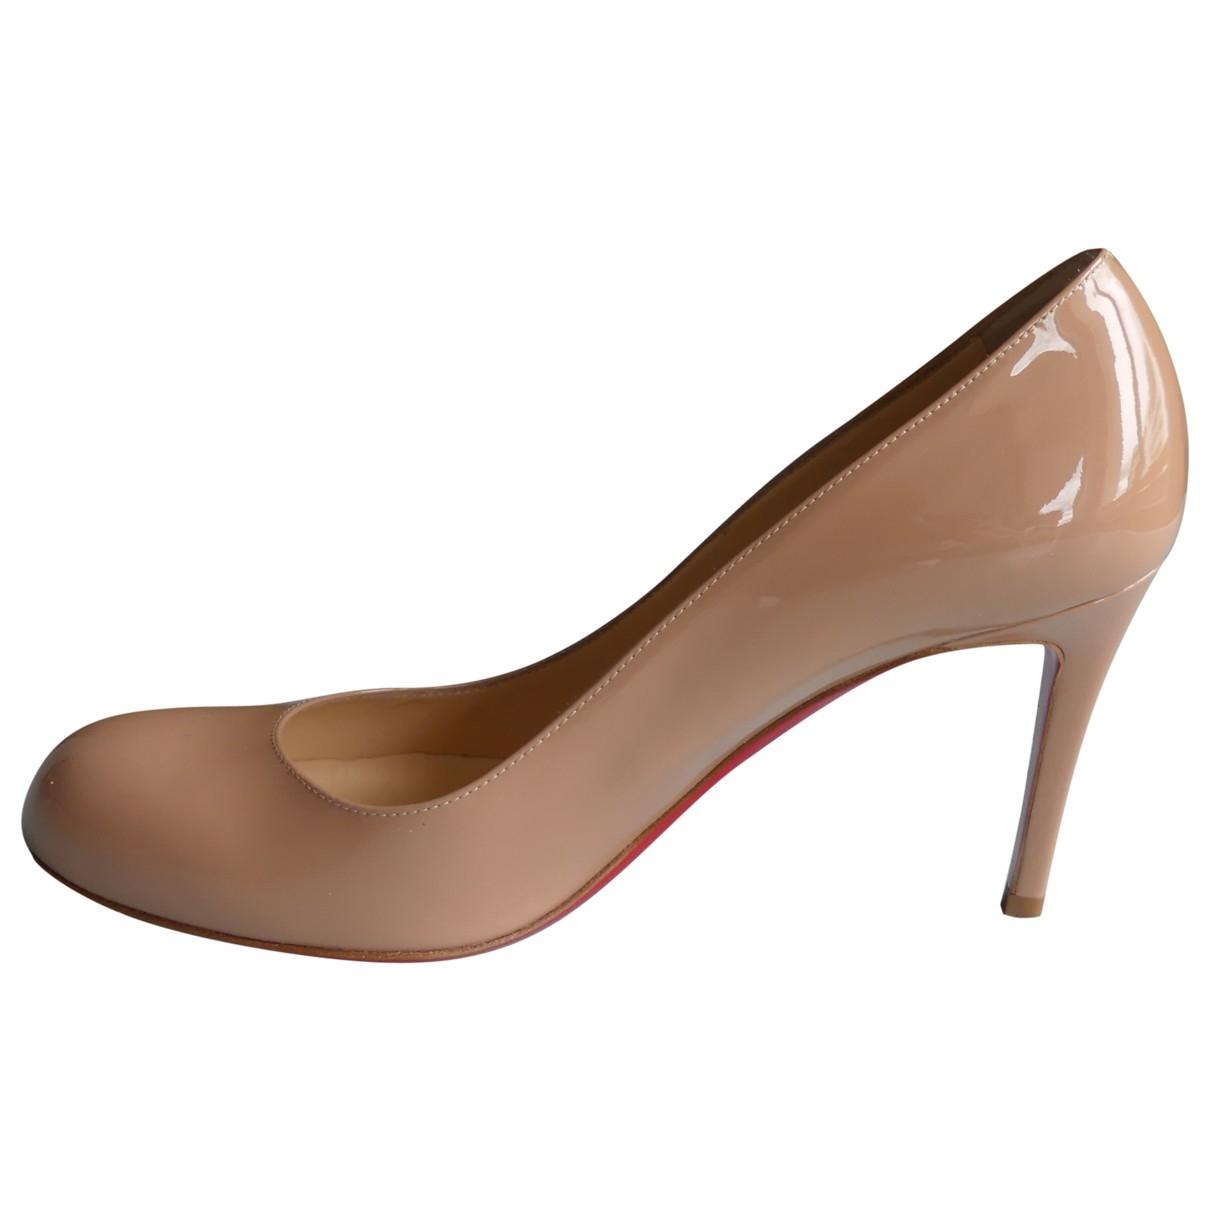 Christian Louboutin Simple pump Beige Patent leather Heels for Women 36.5 EU